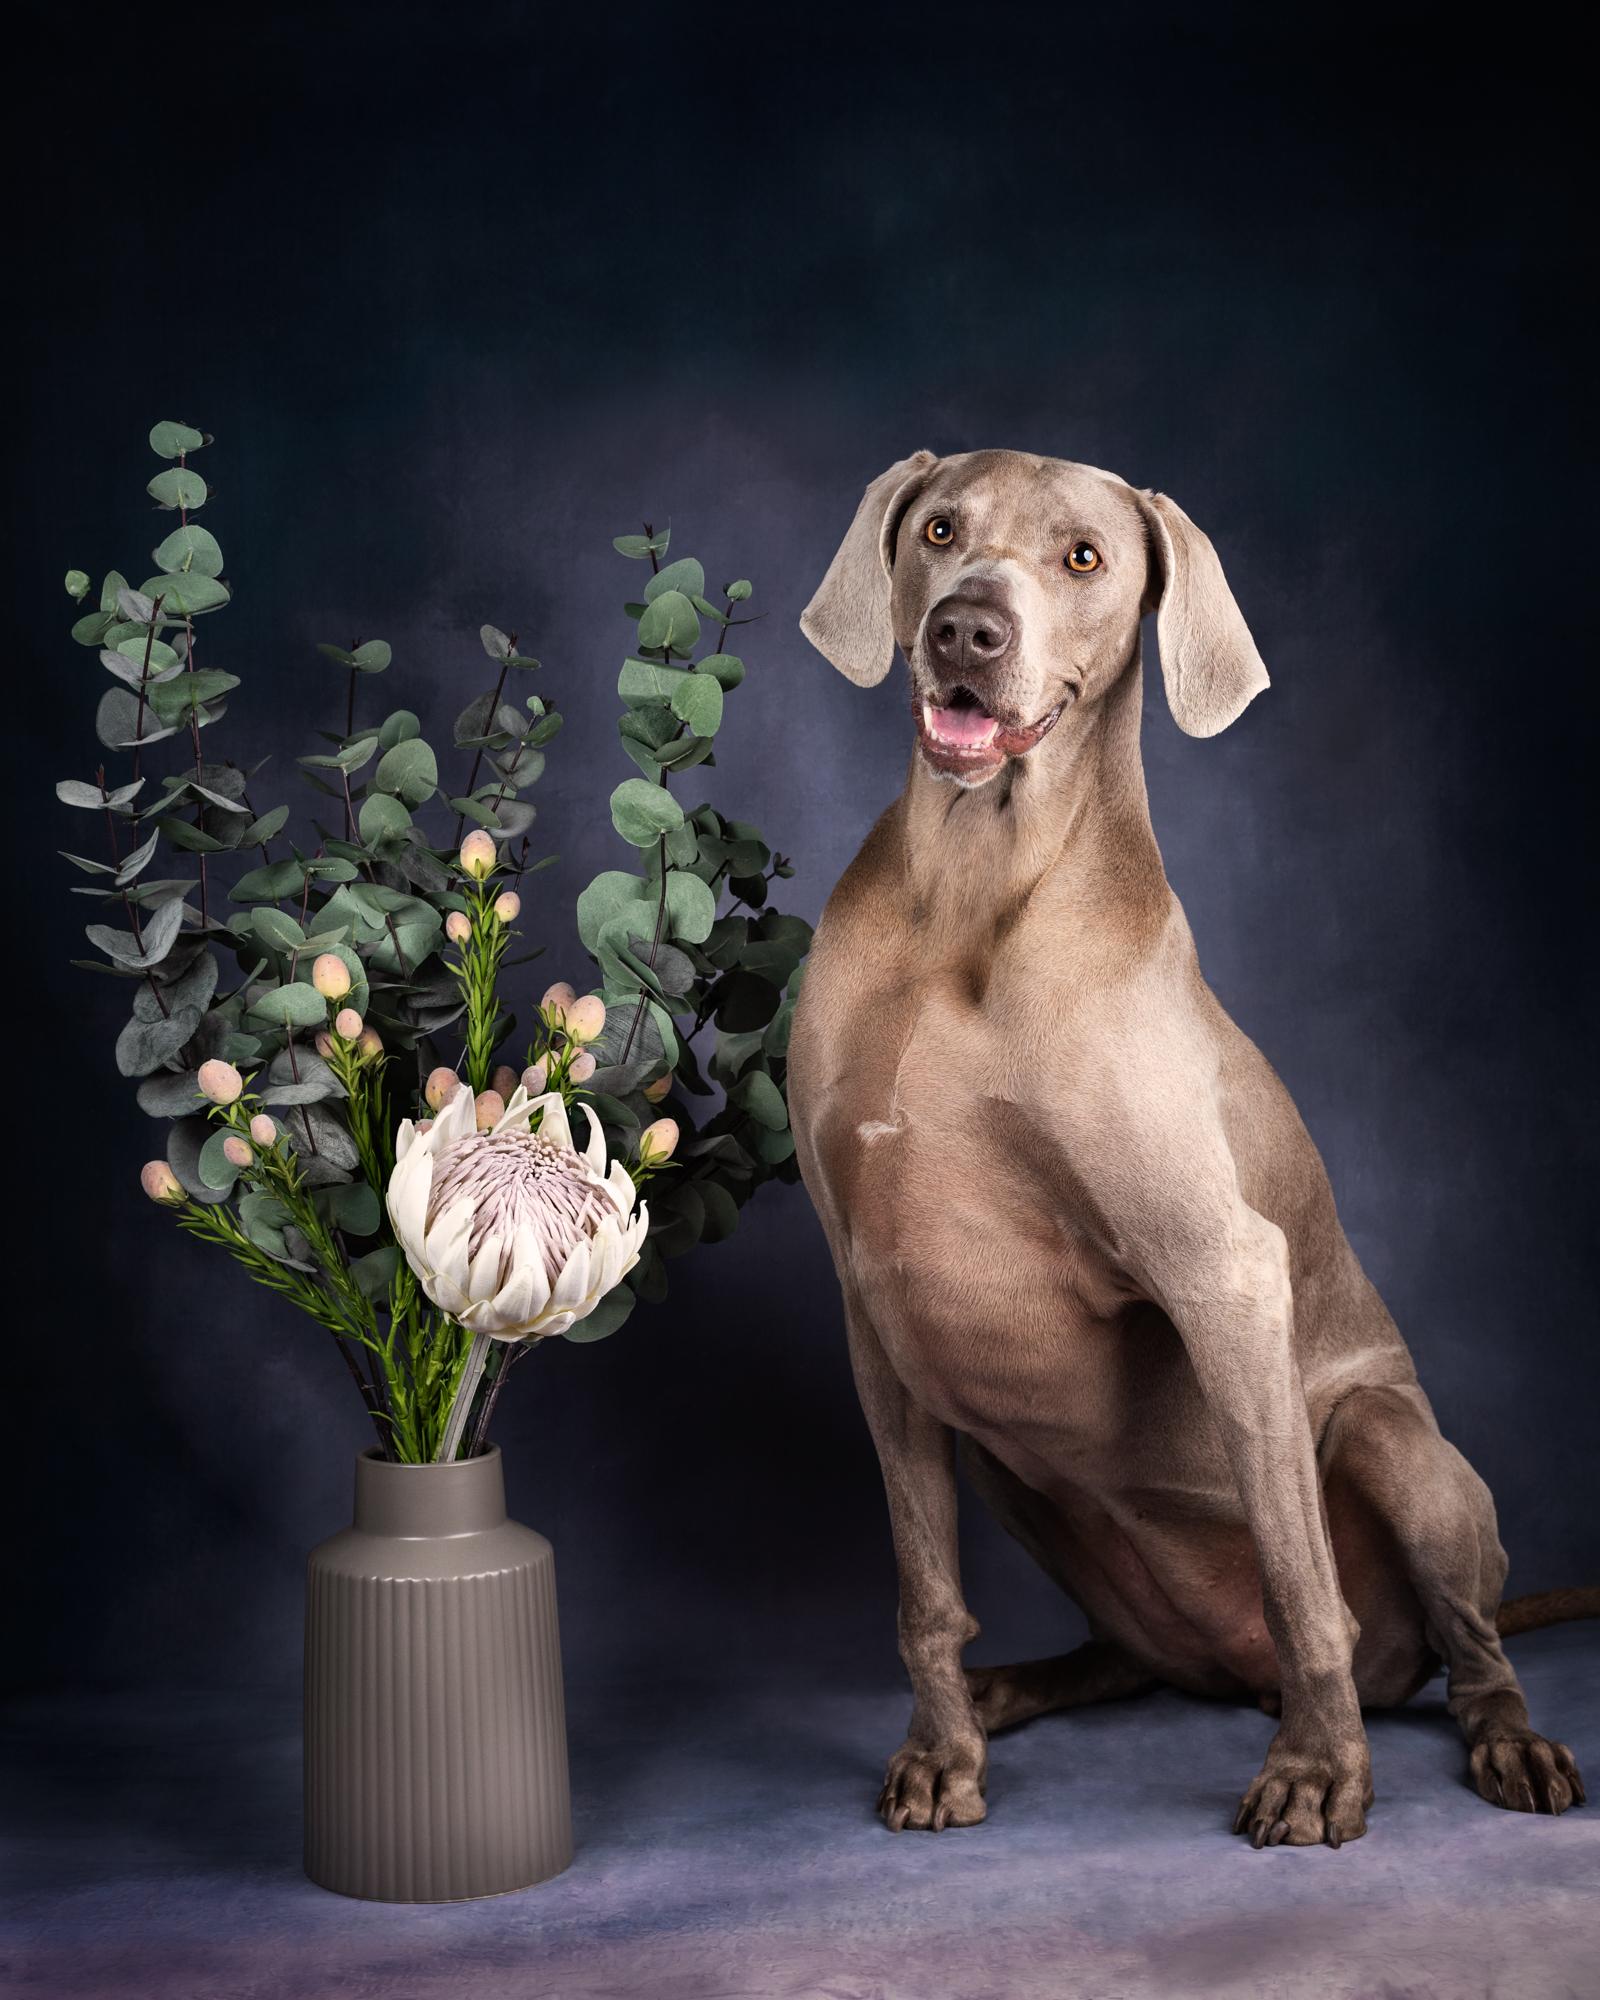 Dixon Dog Photography, Dixon Photography, dog photography Melbourne, pet photography Melbourne, Melbourne dog photographer, pet dog photos Melbourne, studio dog photography, weimerana, grey dog, big dog, dog and flowers